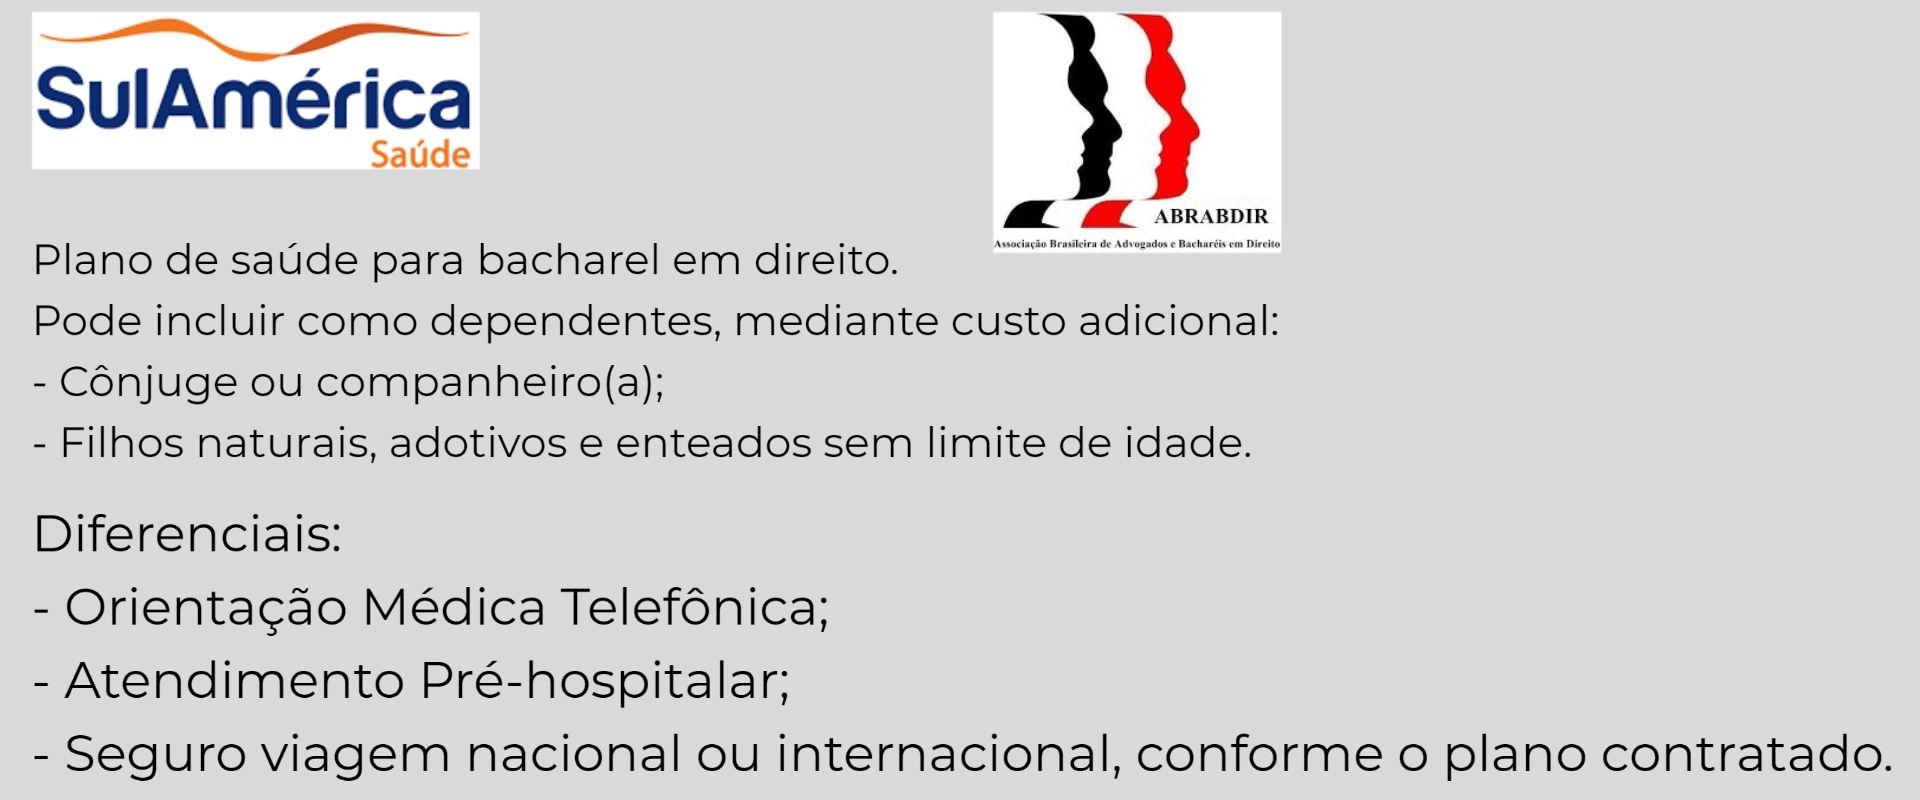 Sul América ABRABDIR-BA